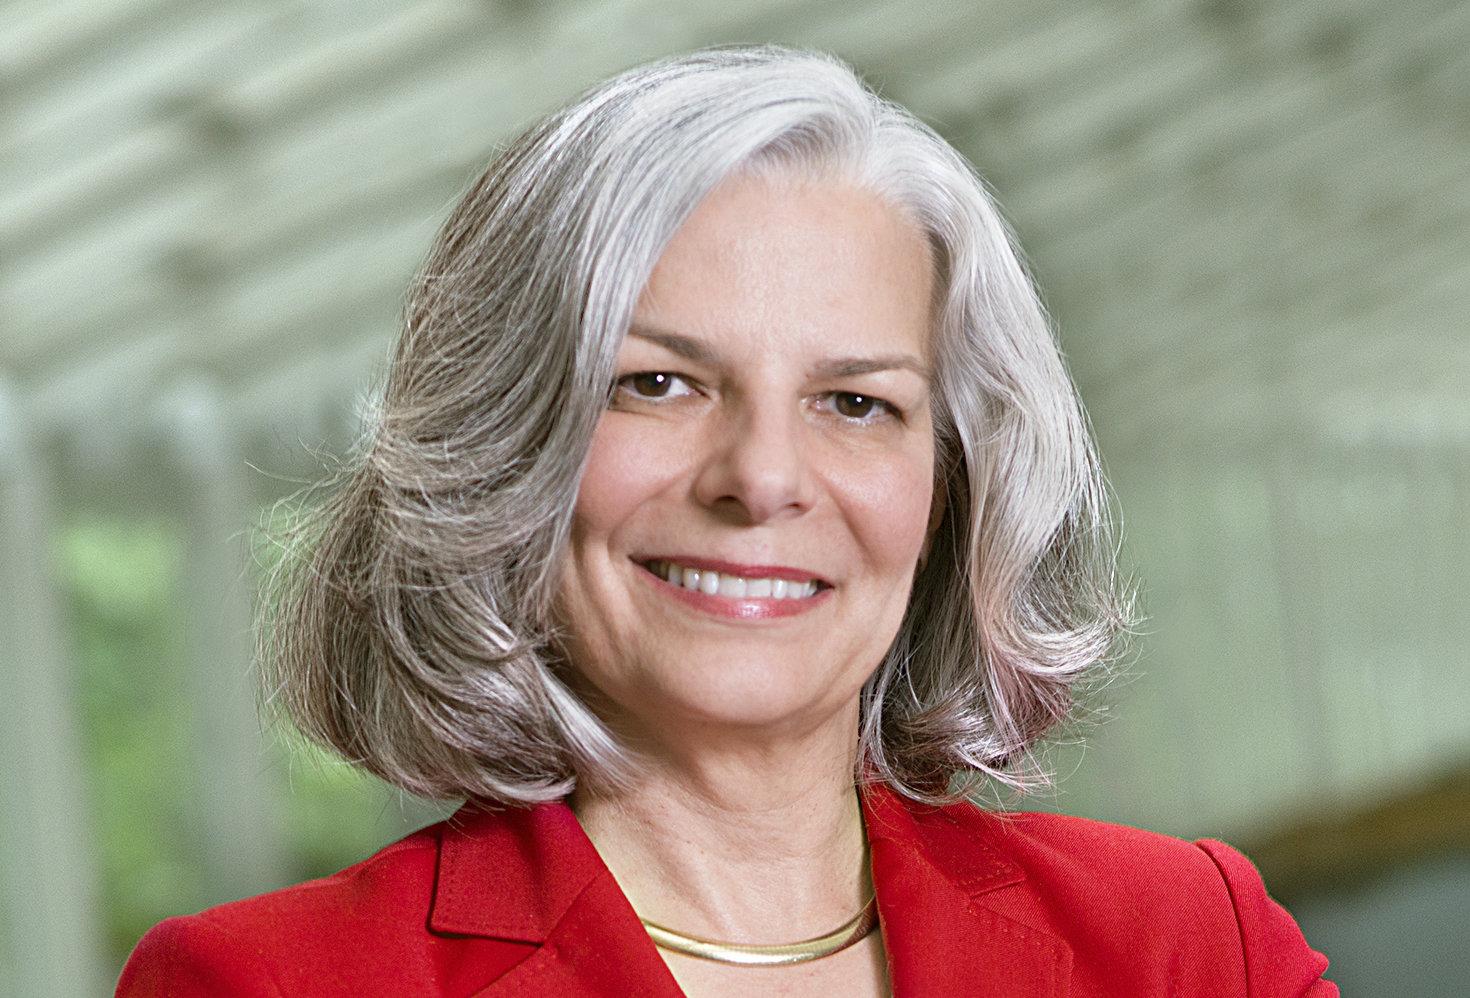 Photo of Julie Louise Gerberding, M.D., M.P.H.